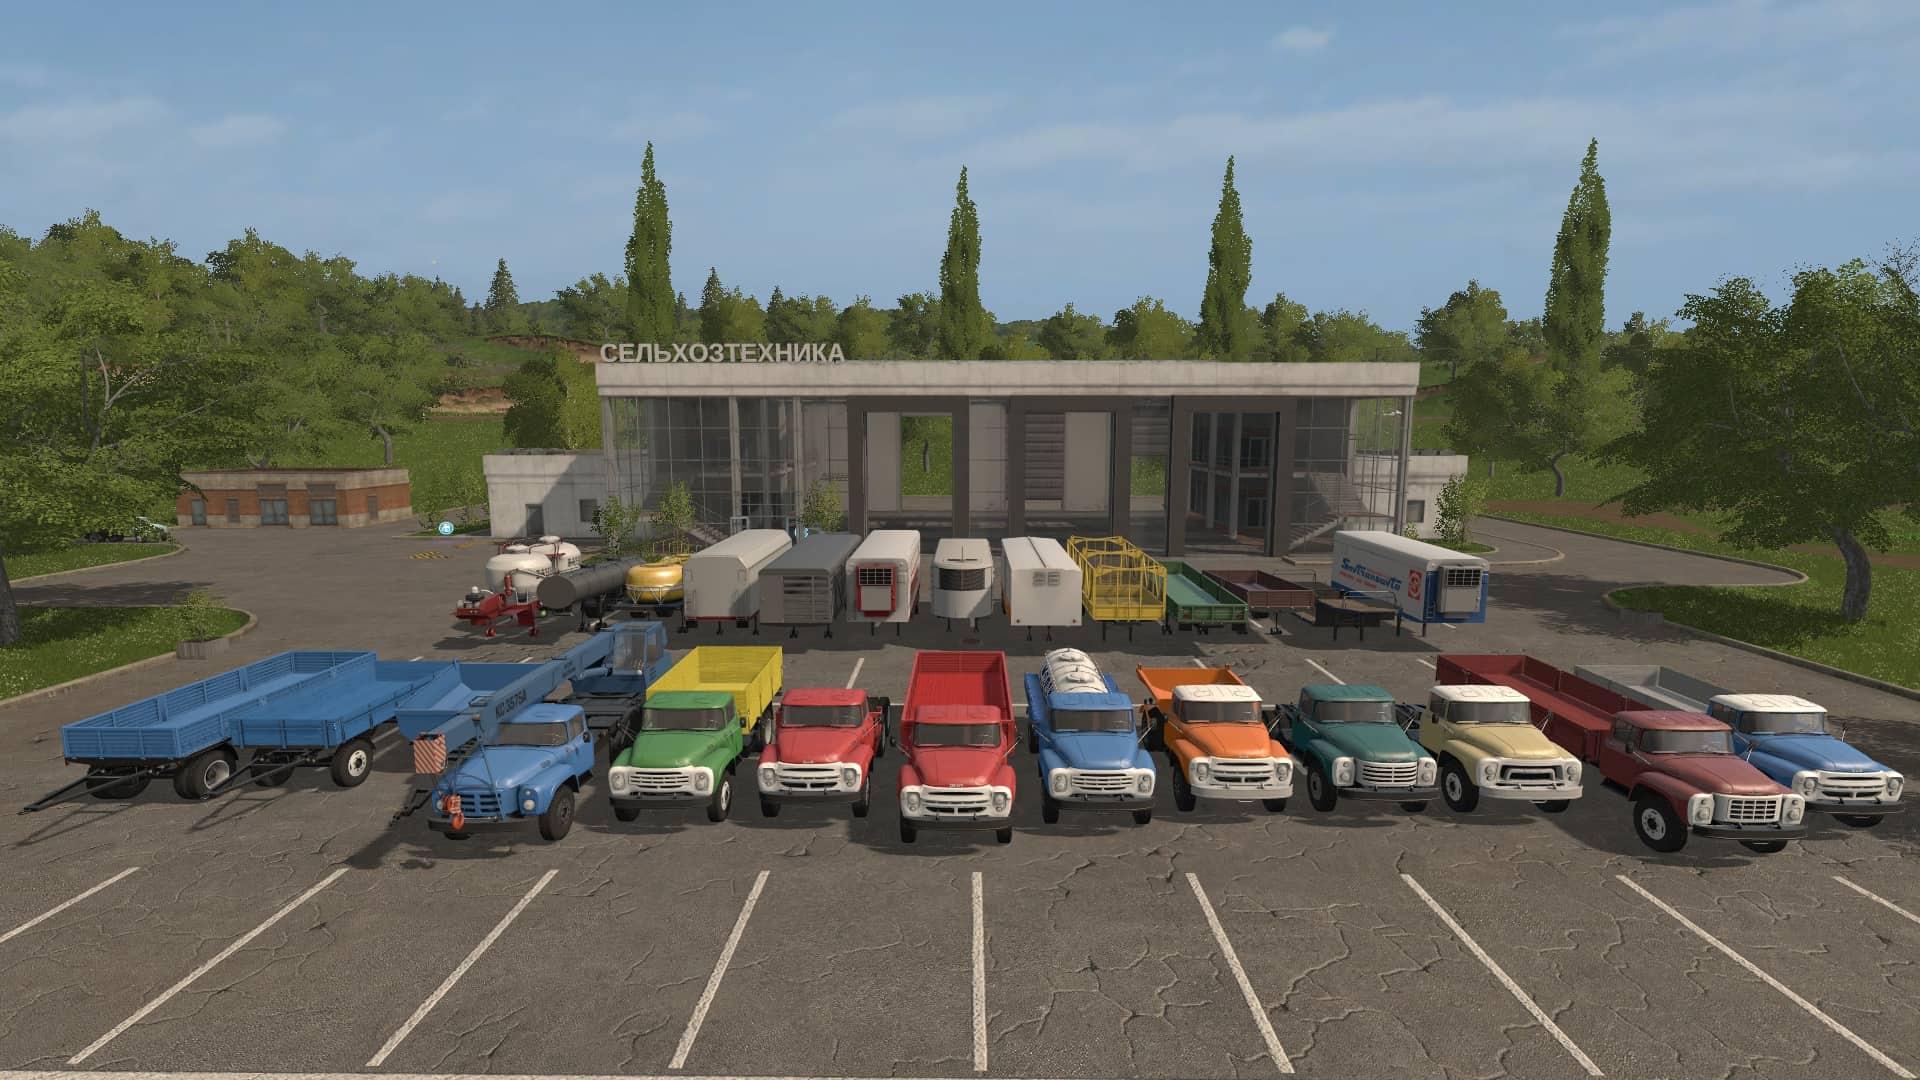 ZiL Truck pack v1.0.0.2 - Farming Simulator 19 Mod / FS19 on